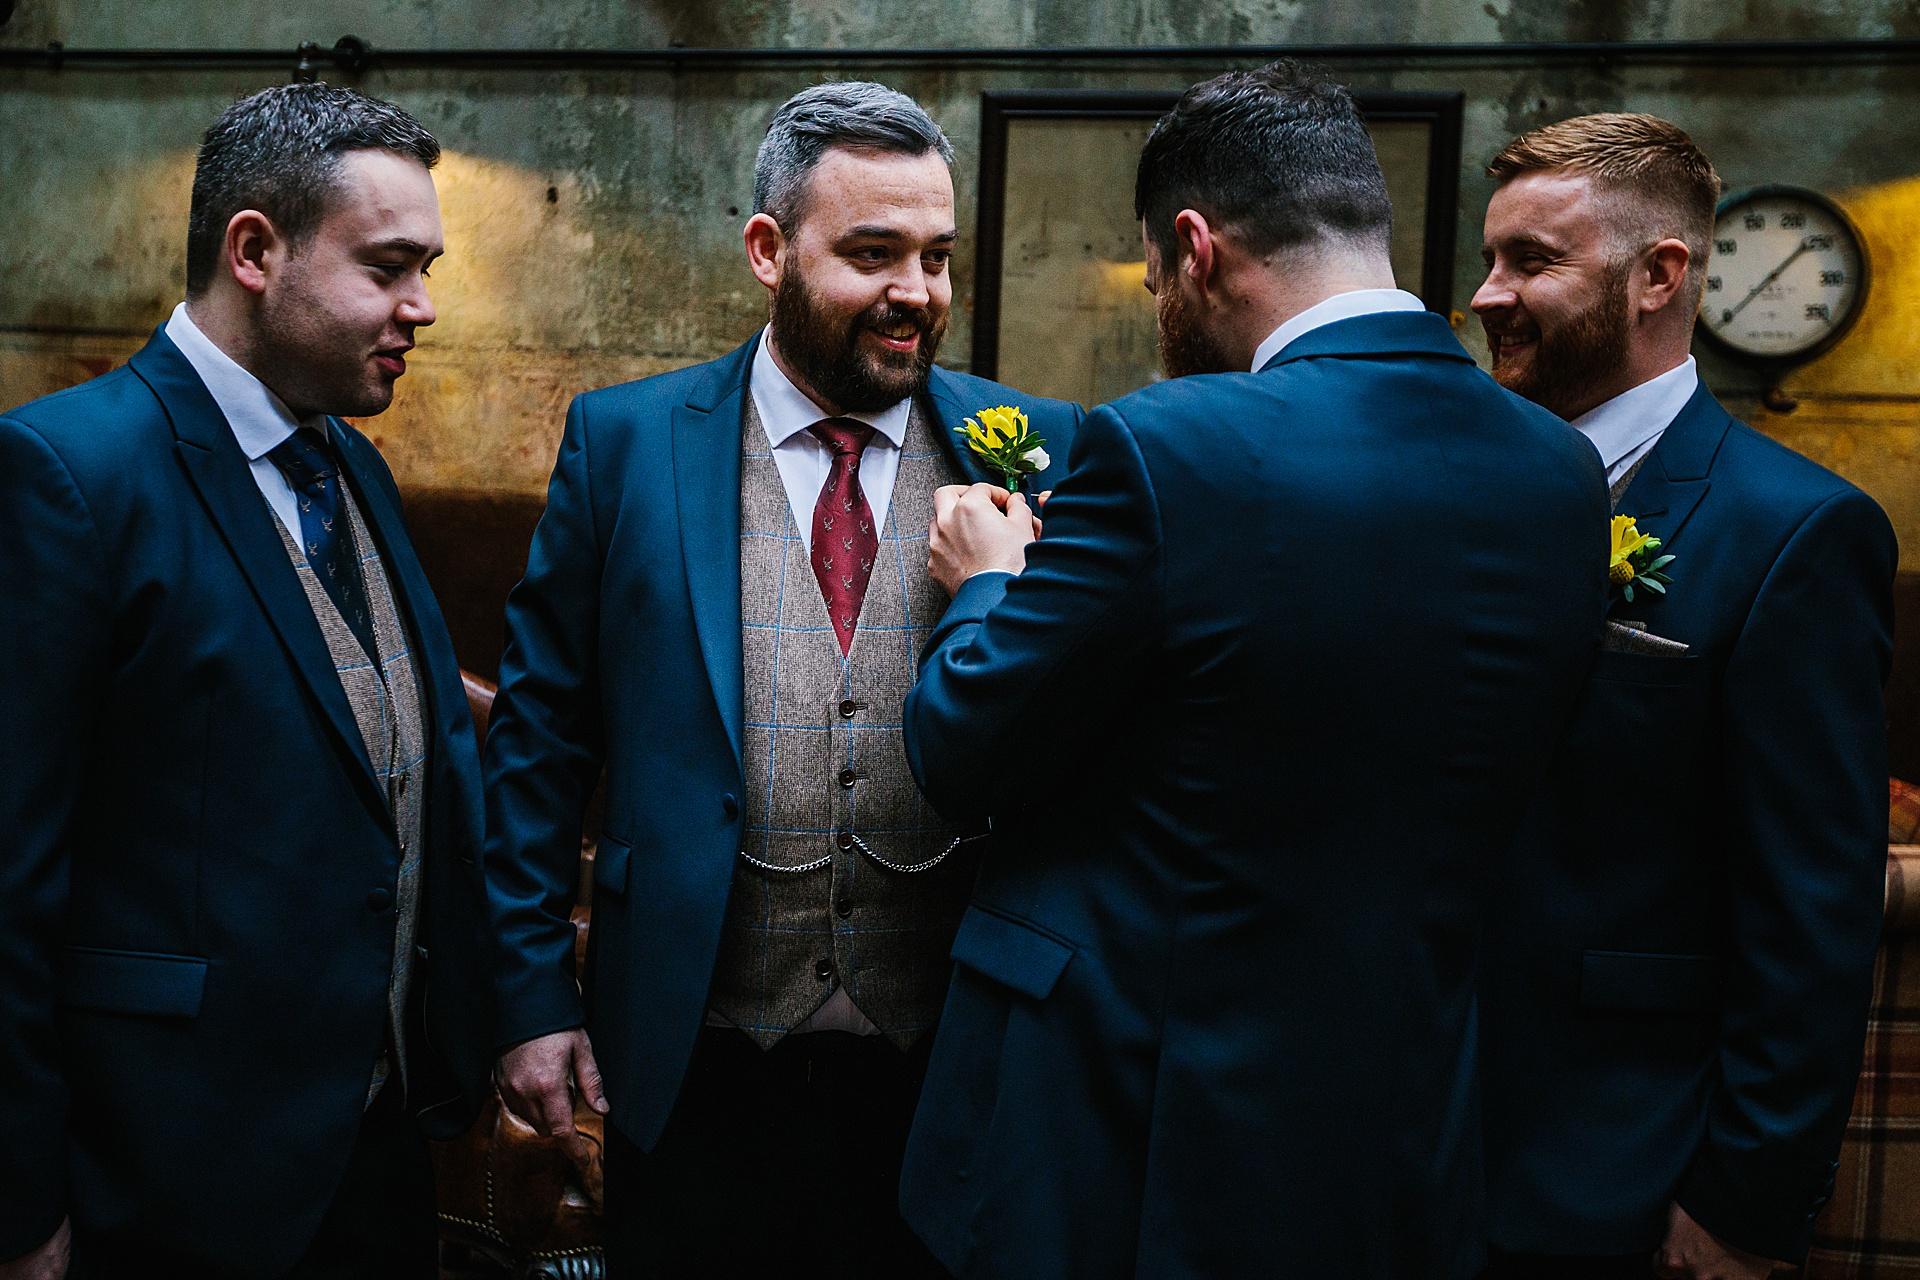 Lancashire award winning wedding photographer Holmes MiLL Clitheroe